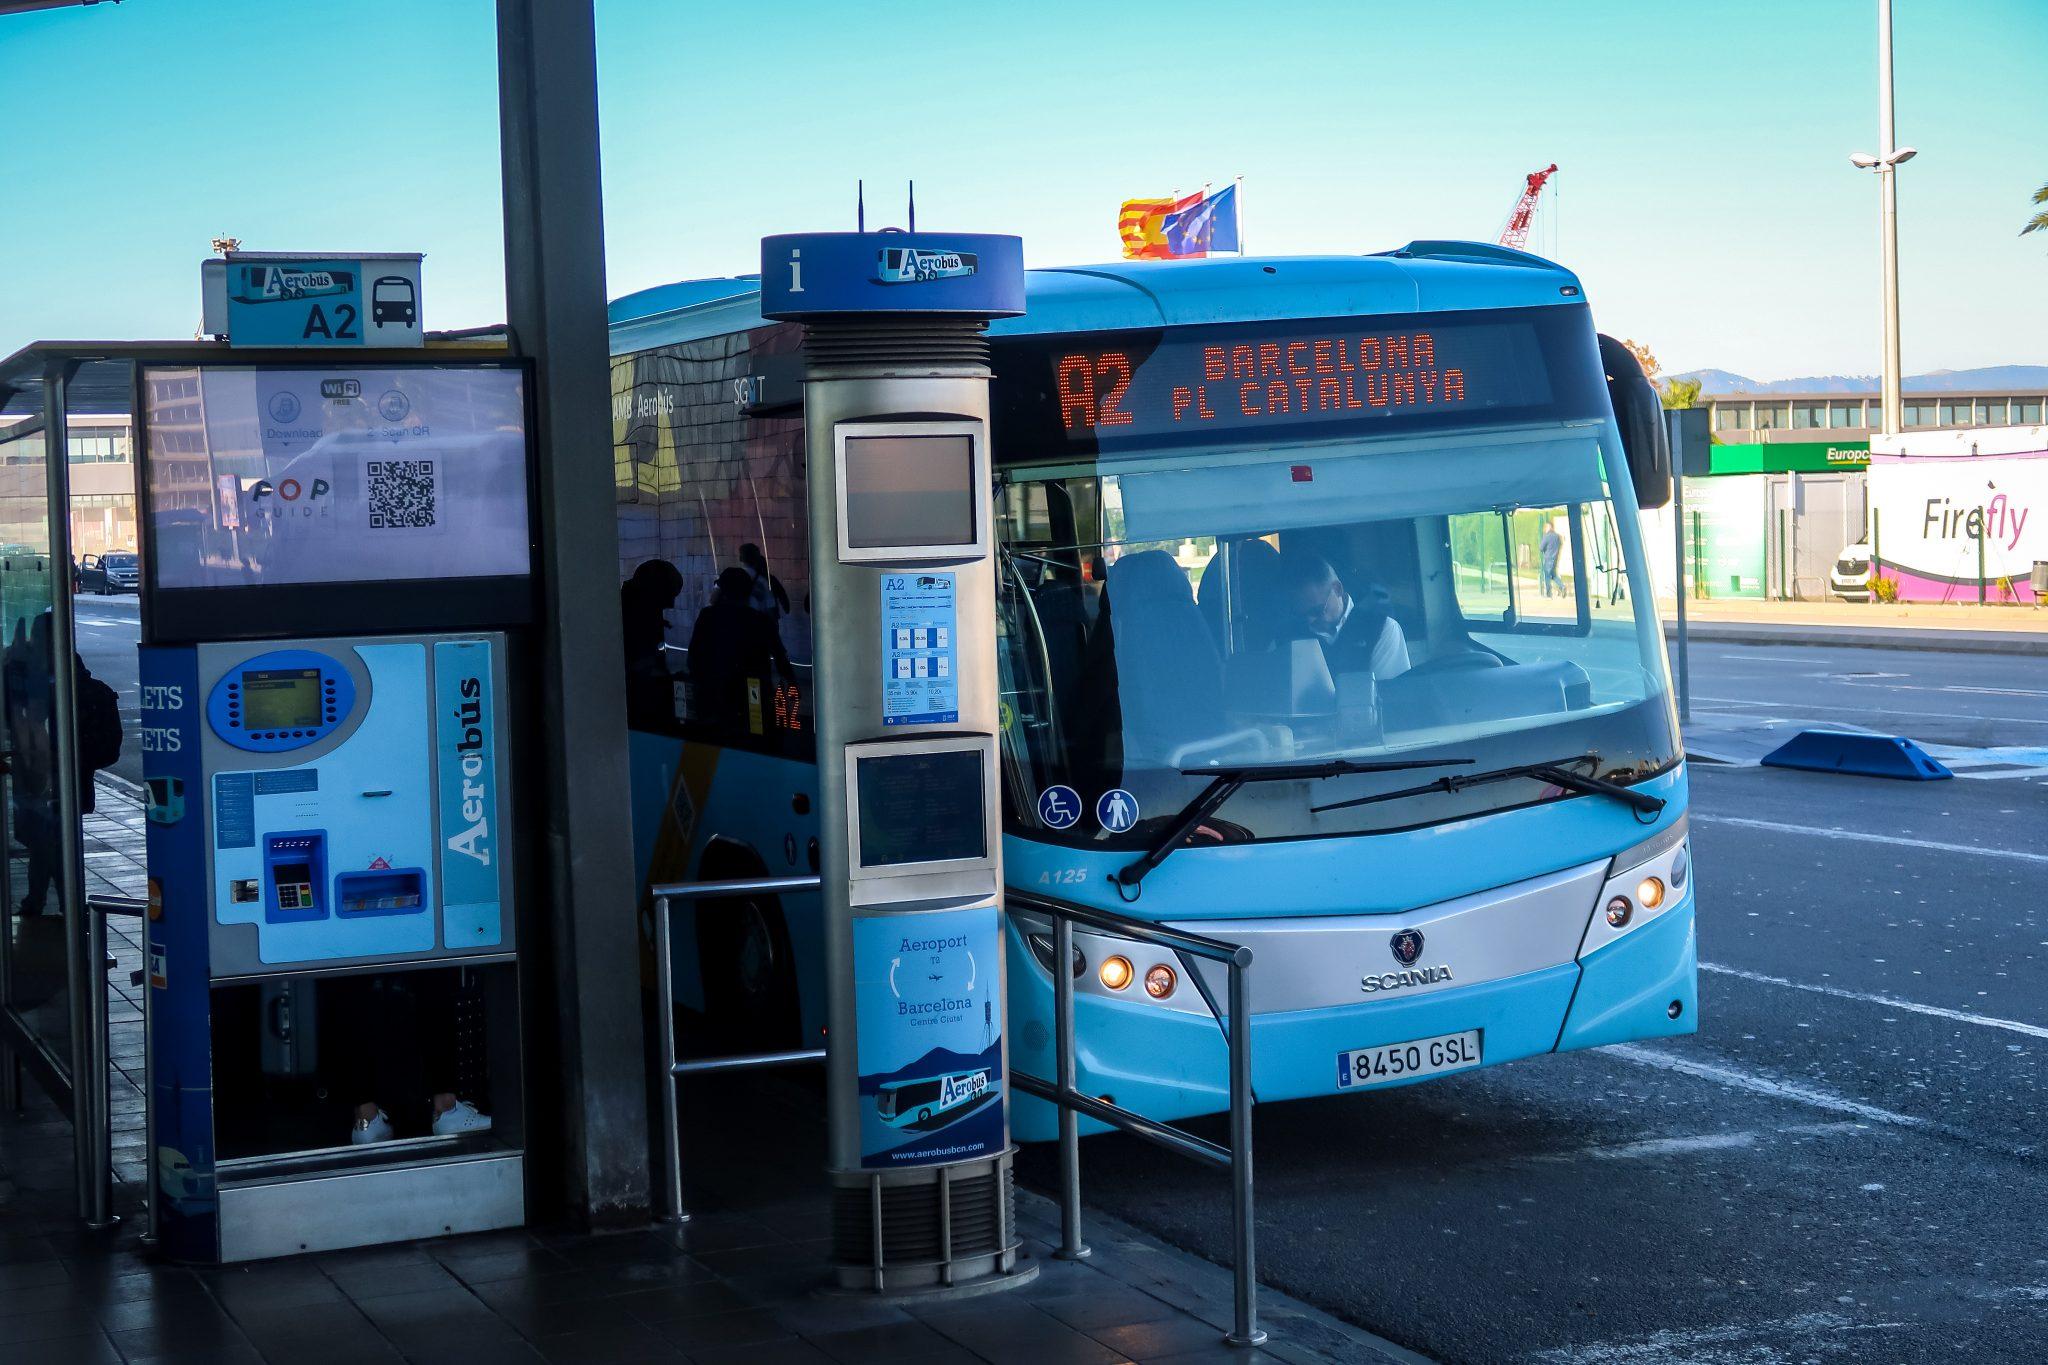 Das ist die Haltestelle des Aerobusses vor dem Terminal 2 des Flughafen El Prat Barcelona.